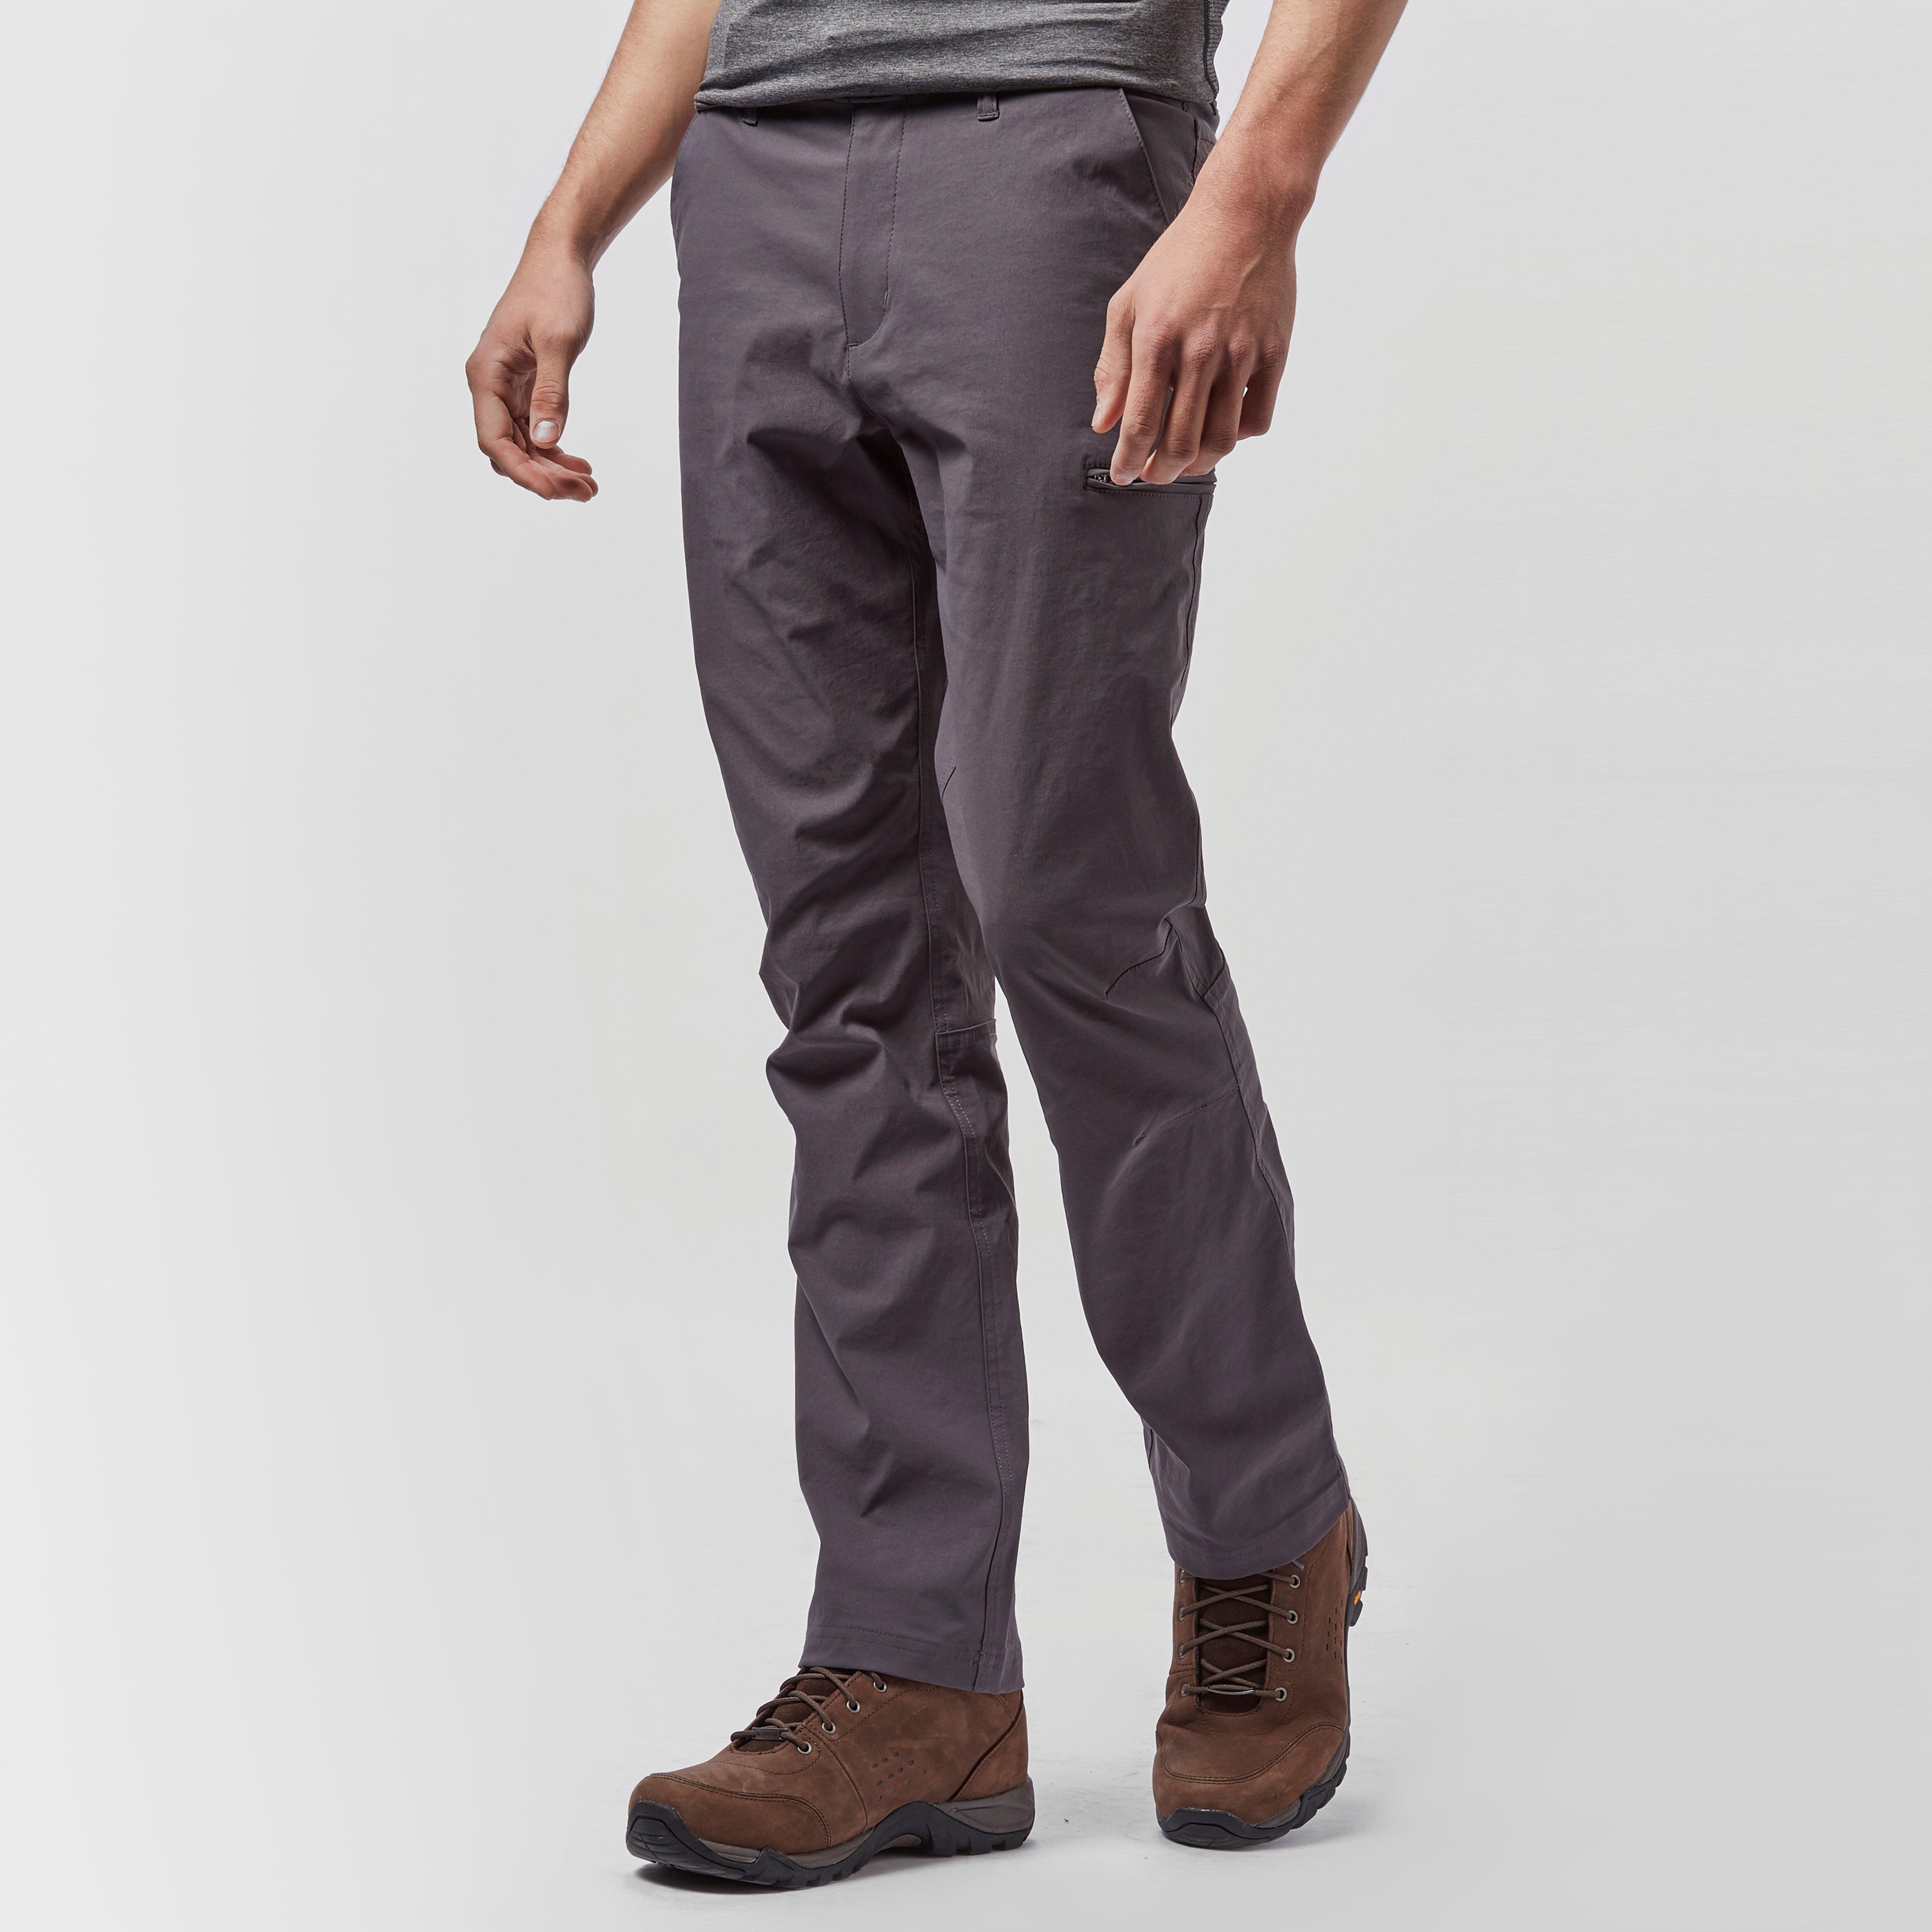 Brasher Brasher Mens Stretch Trousers - Grey, Grey